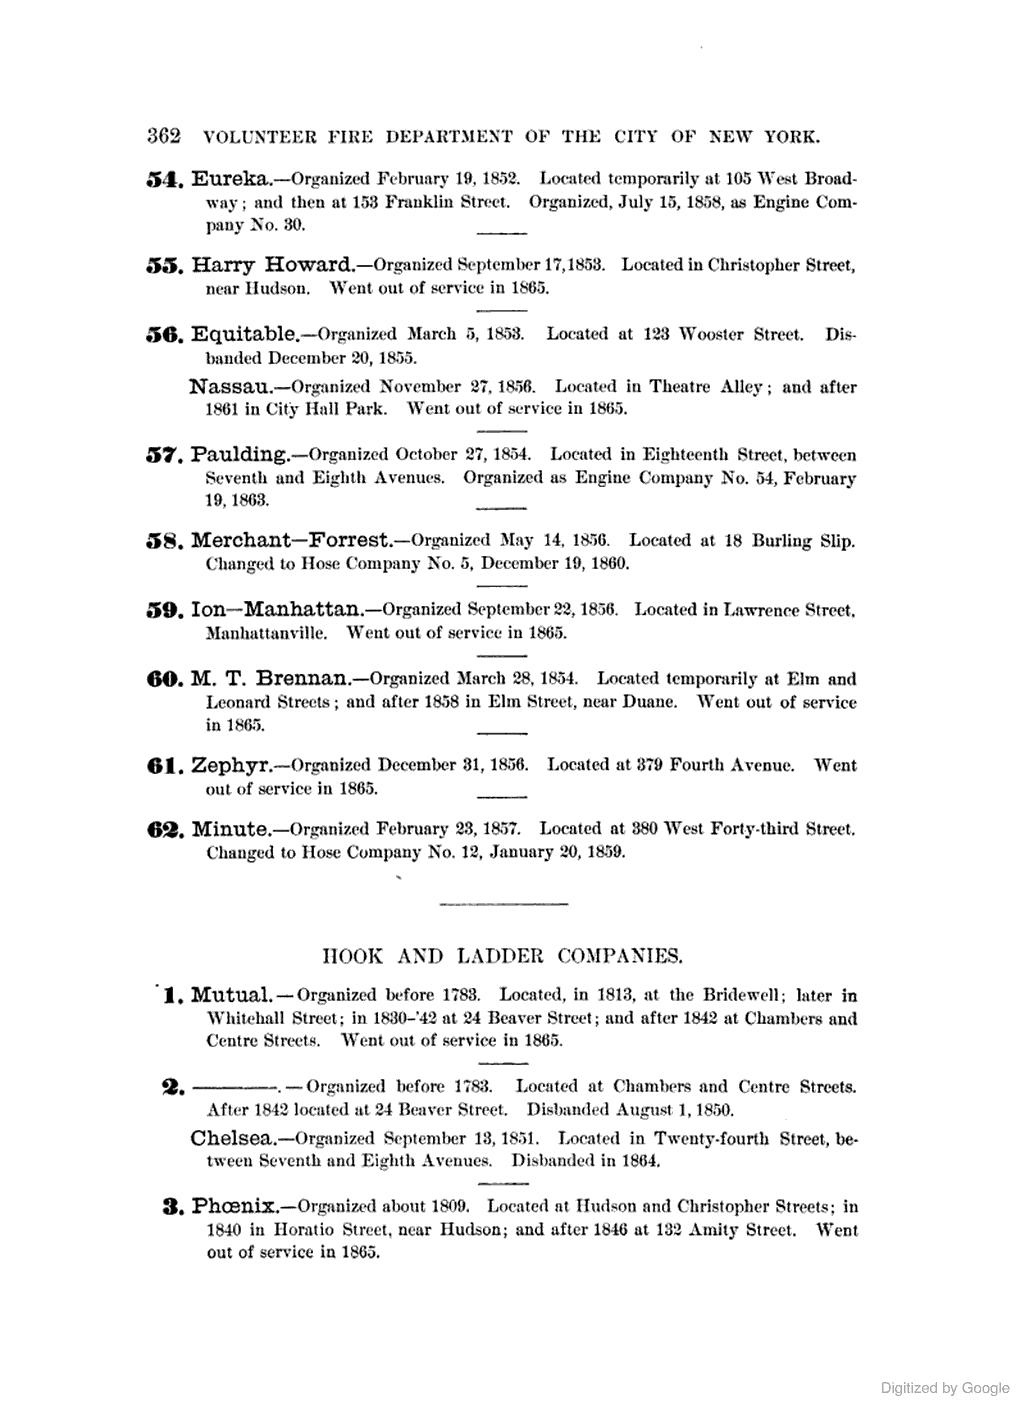 [1884]: HOSE COMPANIES. (last)[Sheldon, GEO. 1885, The